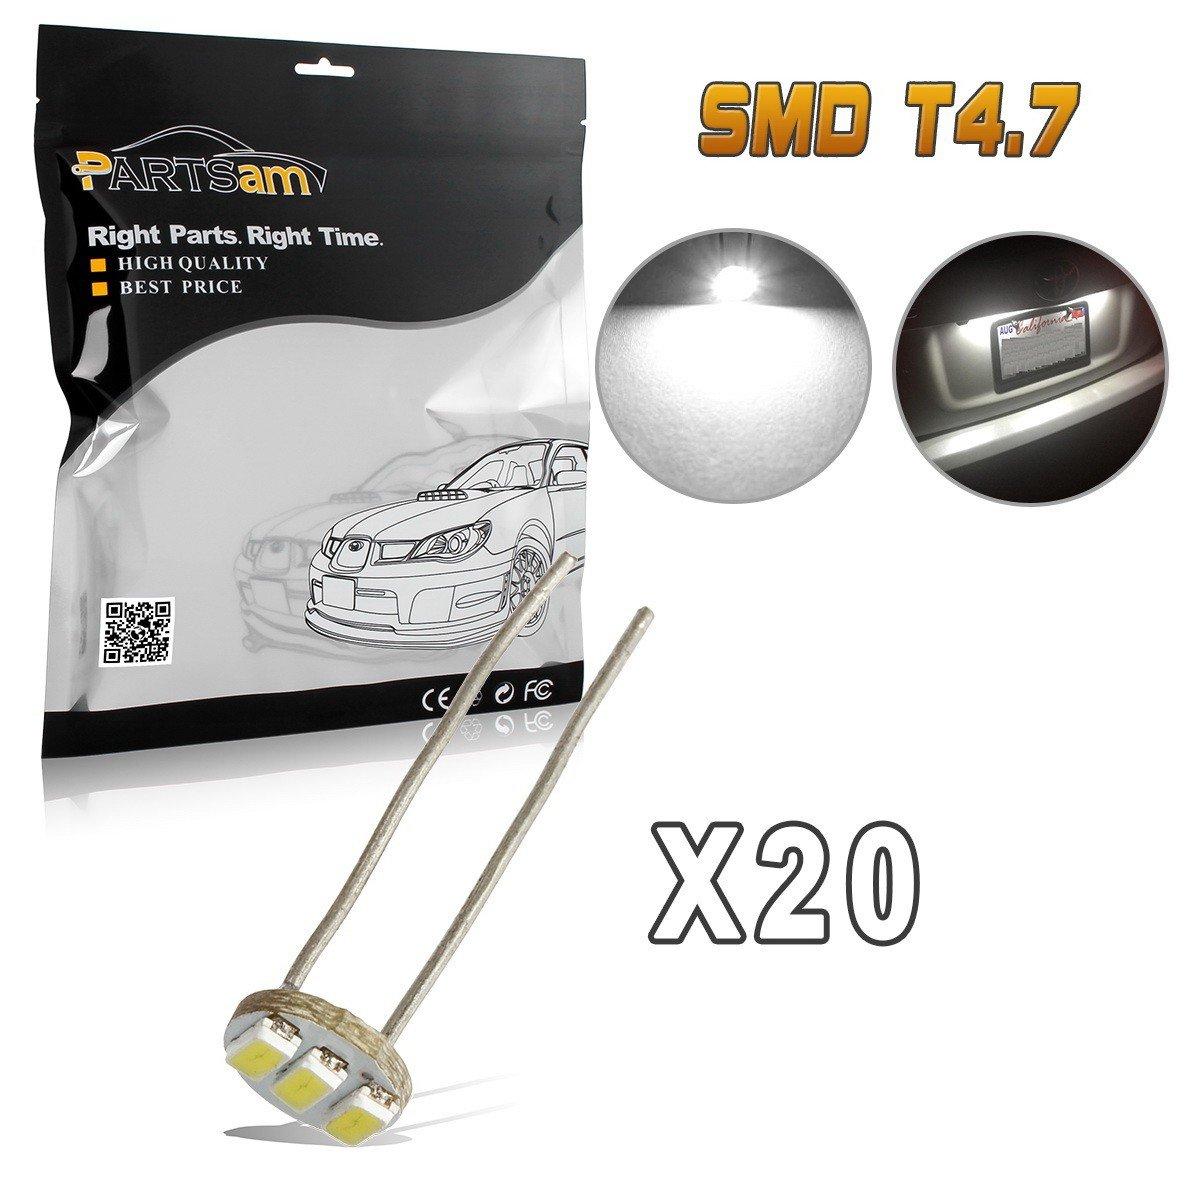 Partsam 20Pcs 4.7mm-12v Car White Mini Bulbs Lamps Indicator Cluster Speedometer Backlight Lighting by Partsam